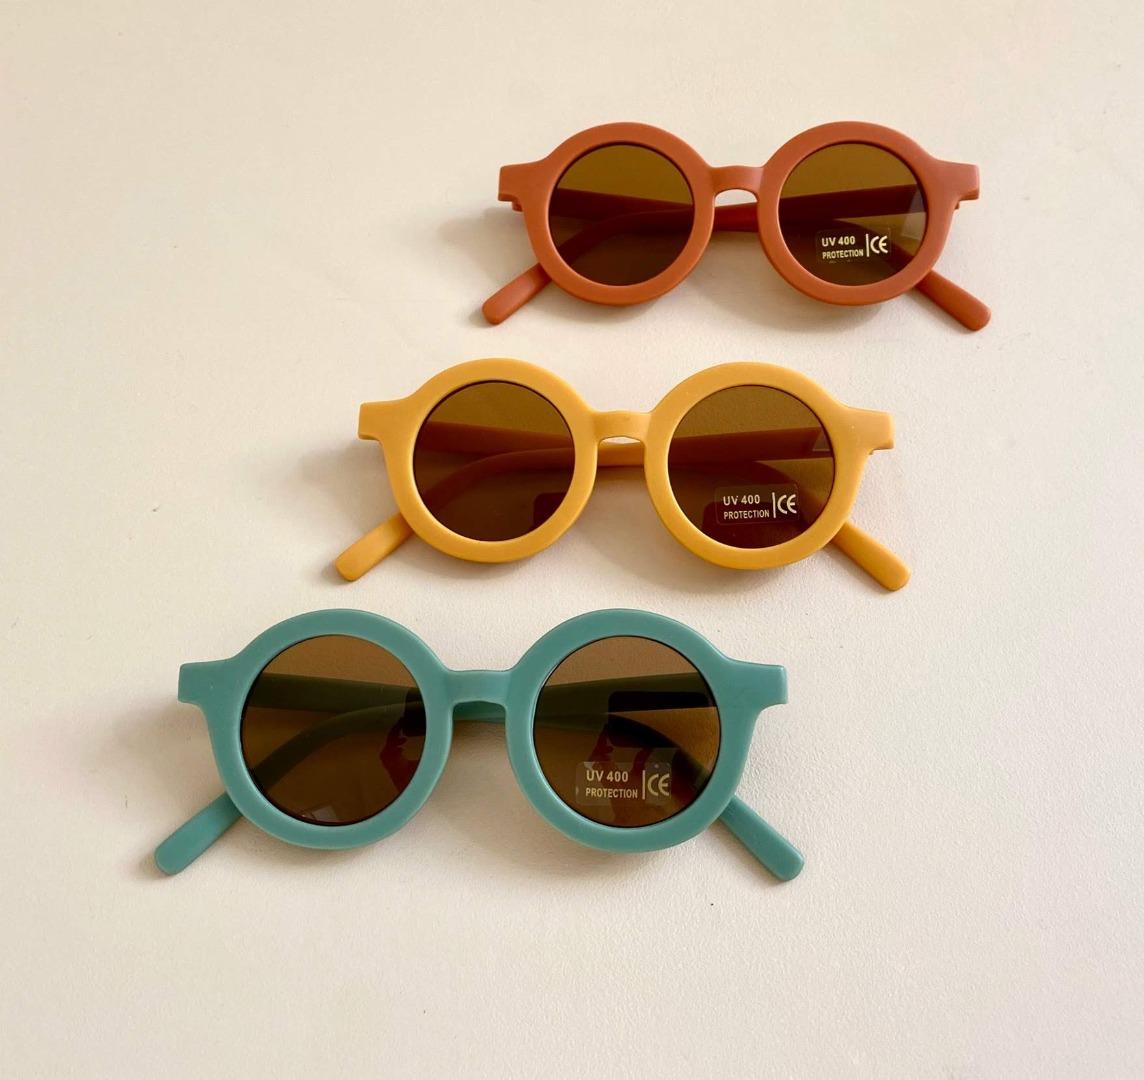 Sonnenbrille Original Spice Grech & Co